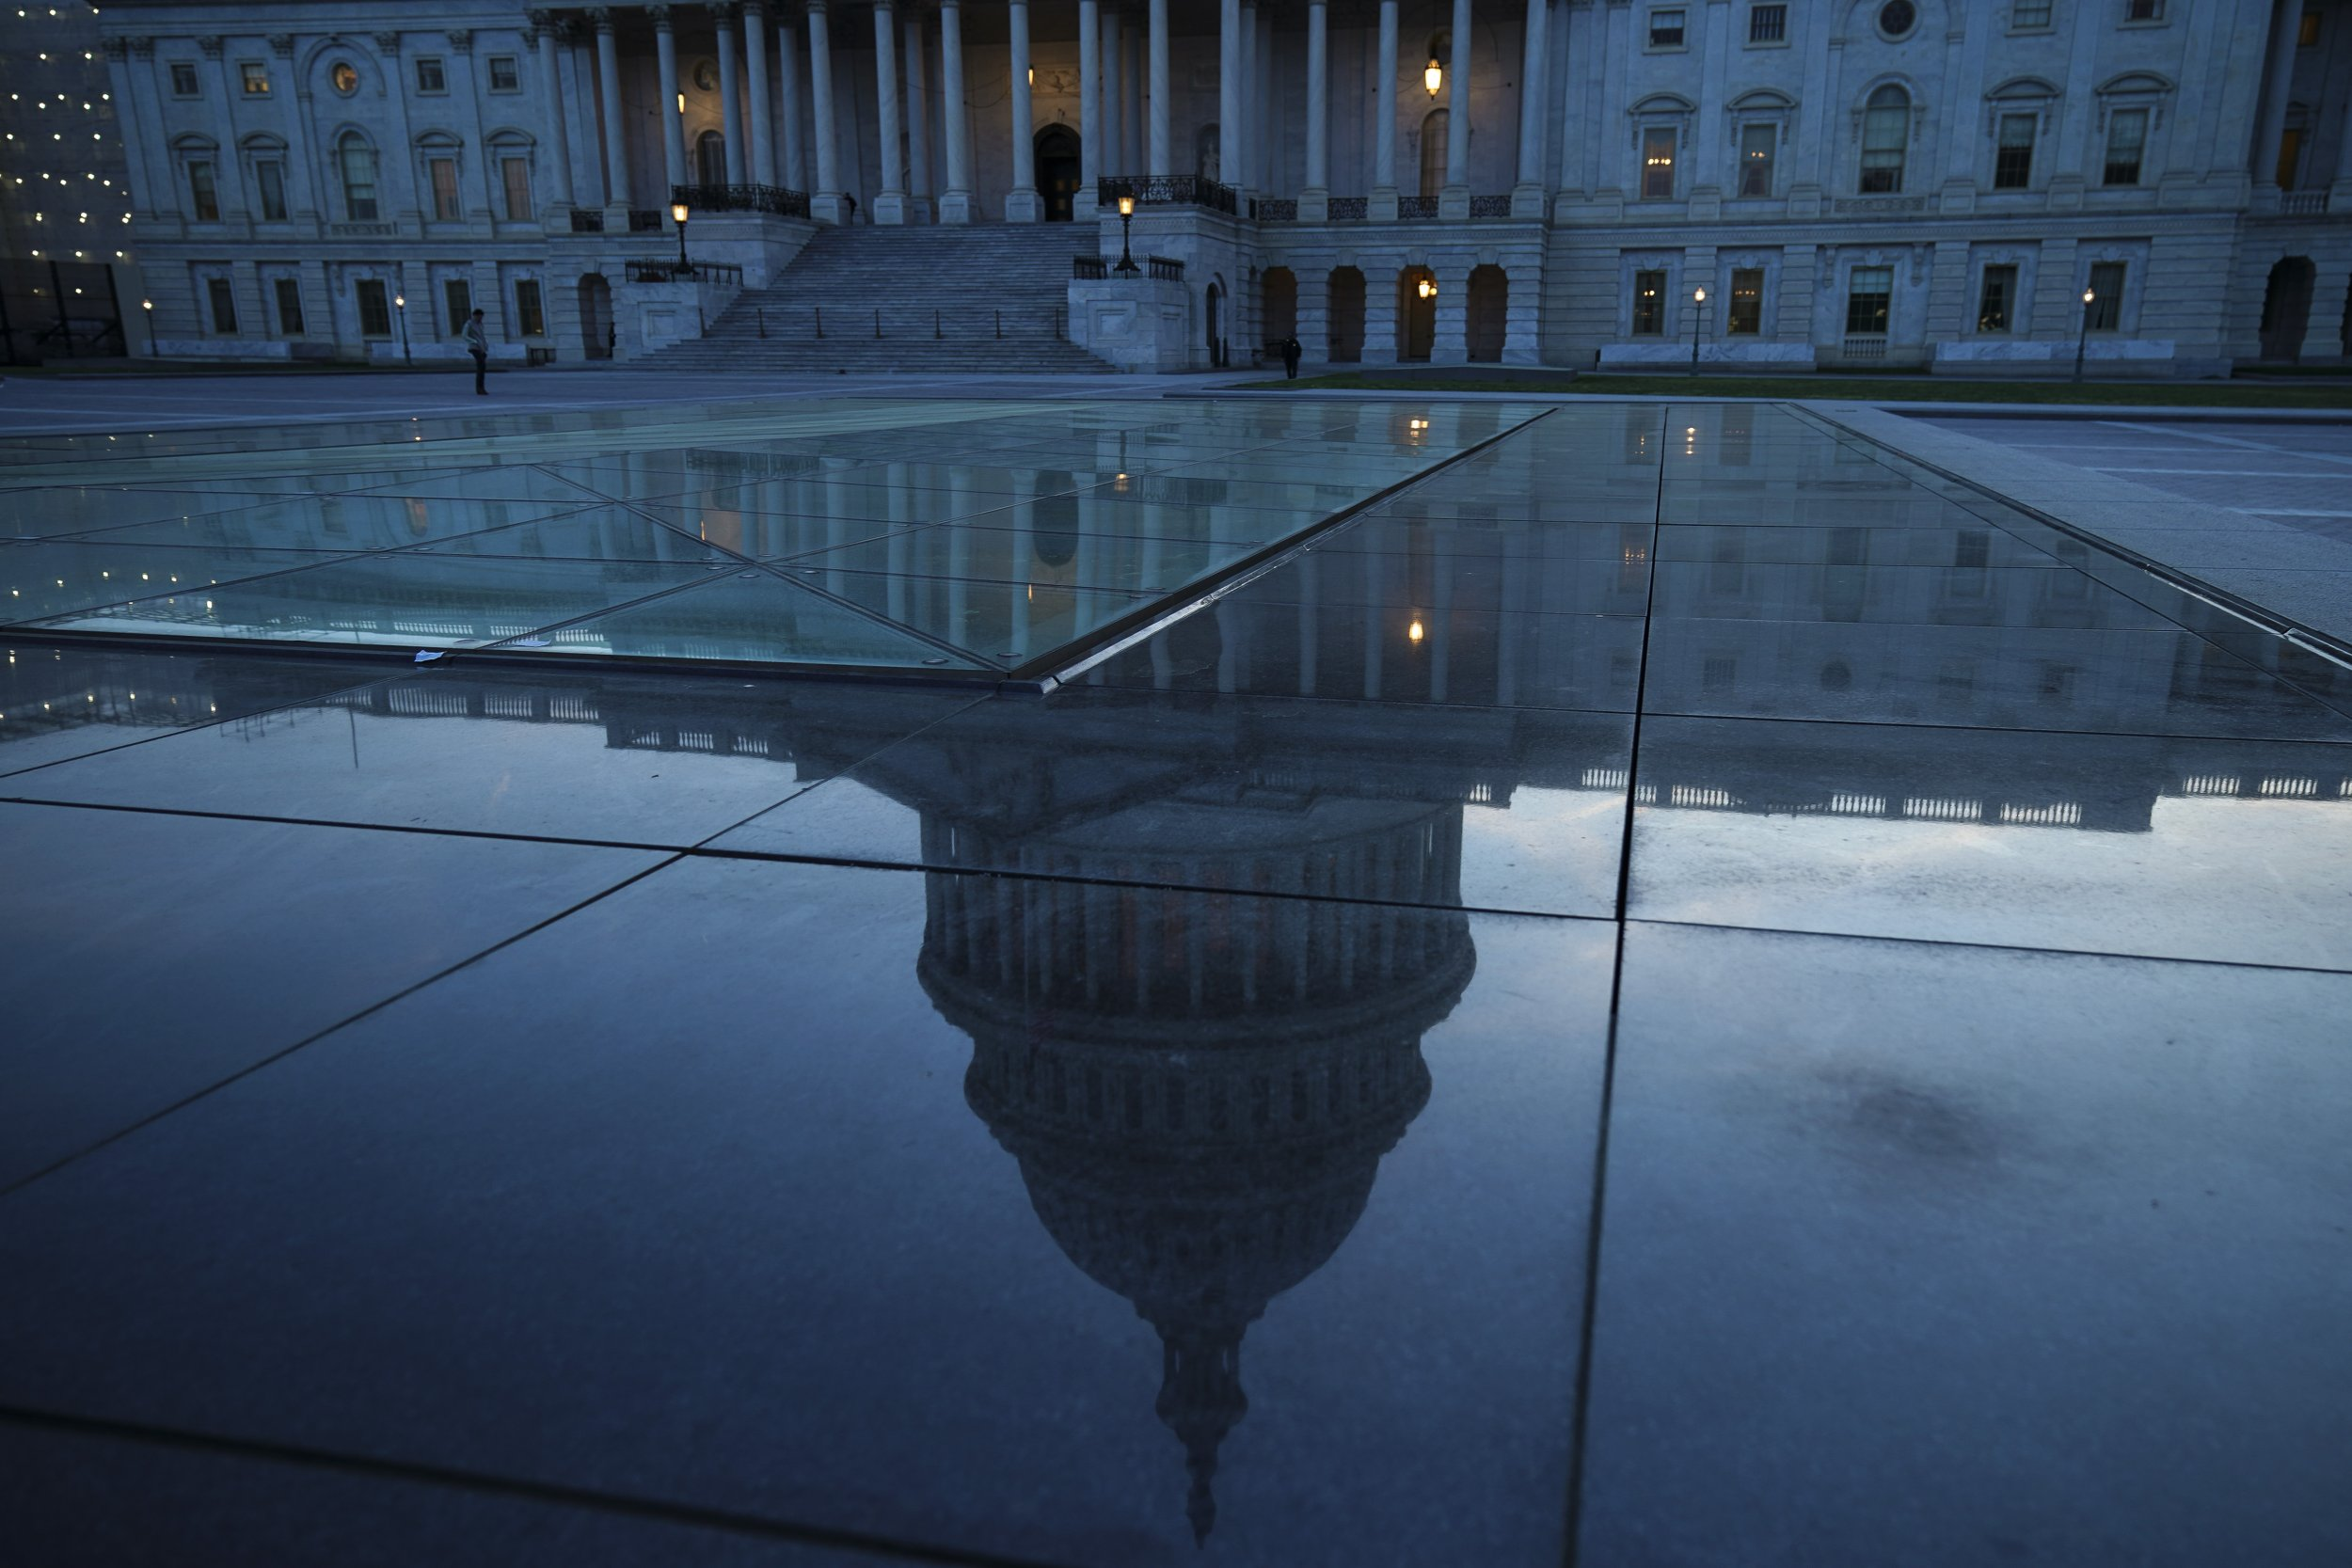 Rep John Rose becomes third Republican to block disaster aid bill